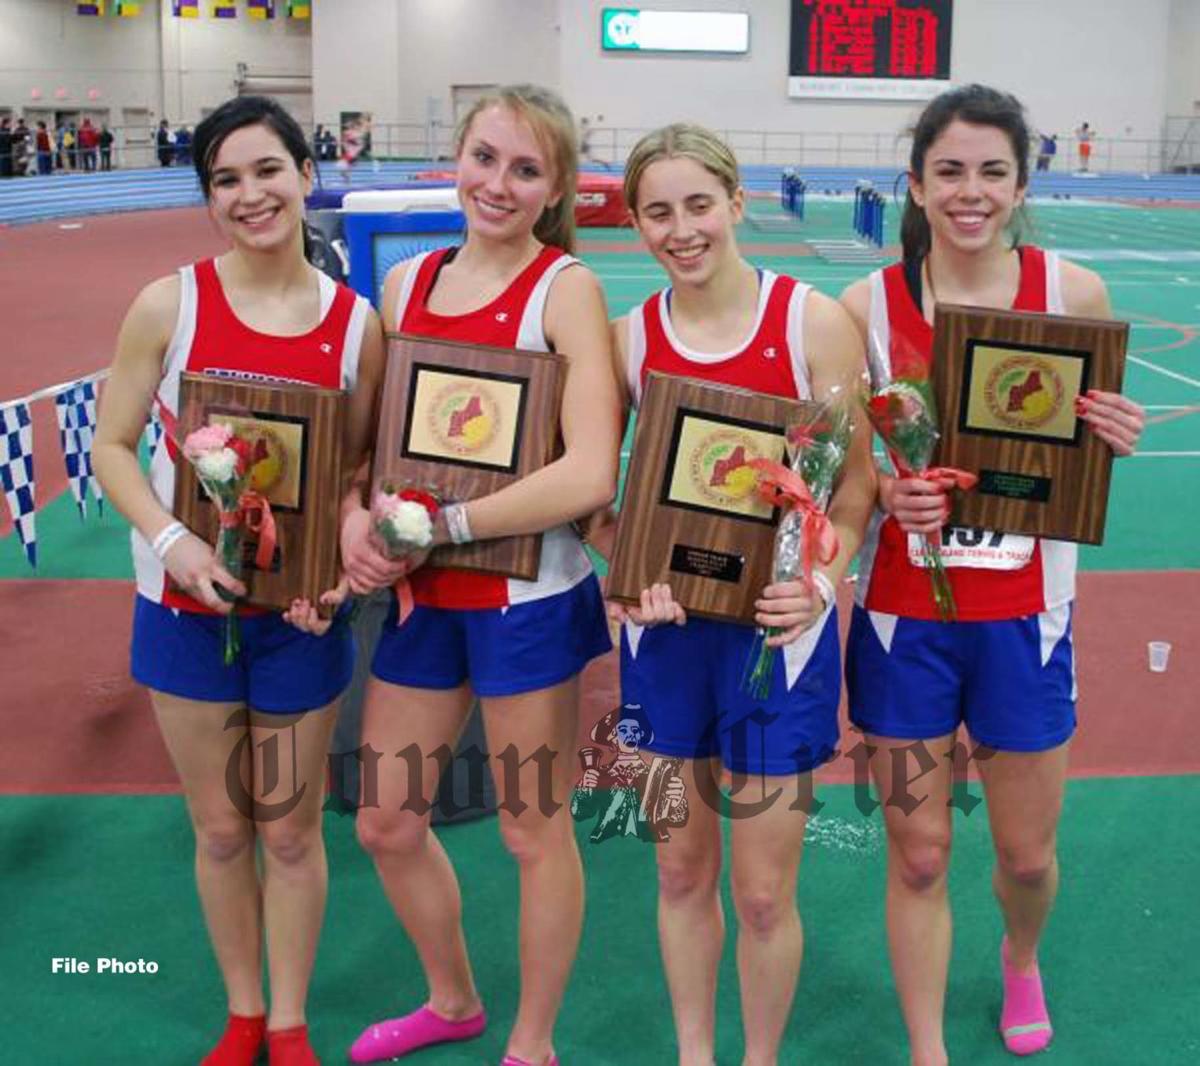 The 2010 TMHS Girls Track team's 4x400 relay team